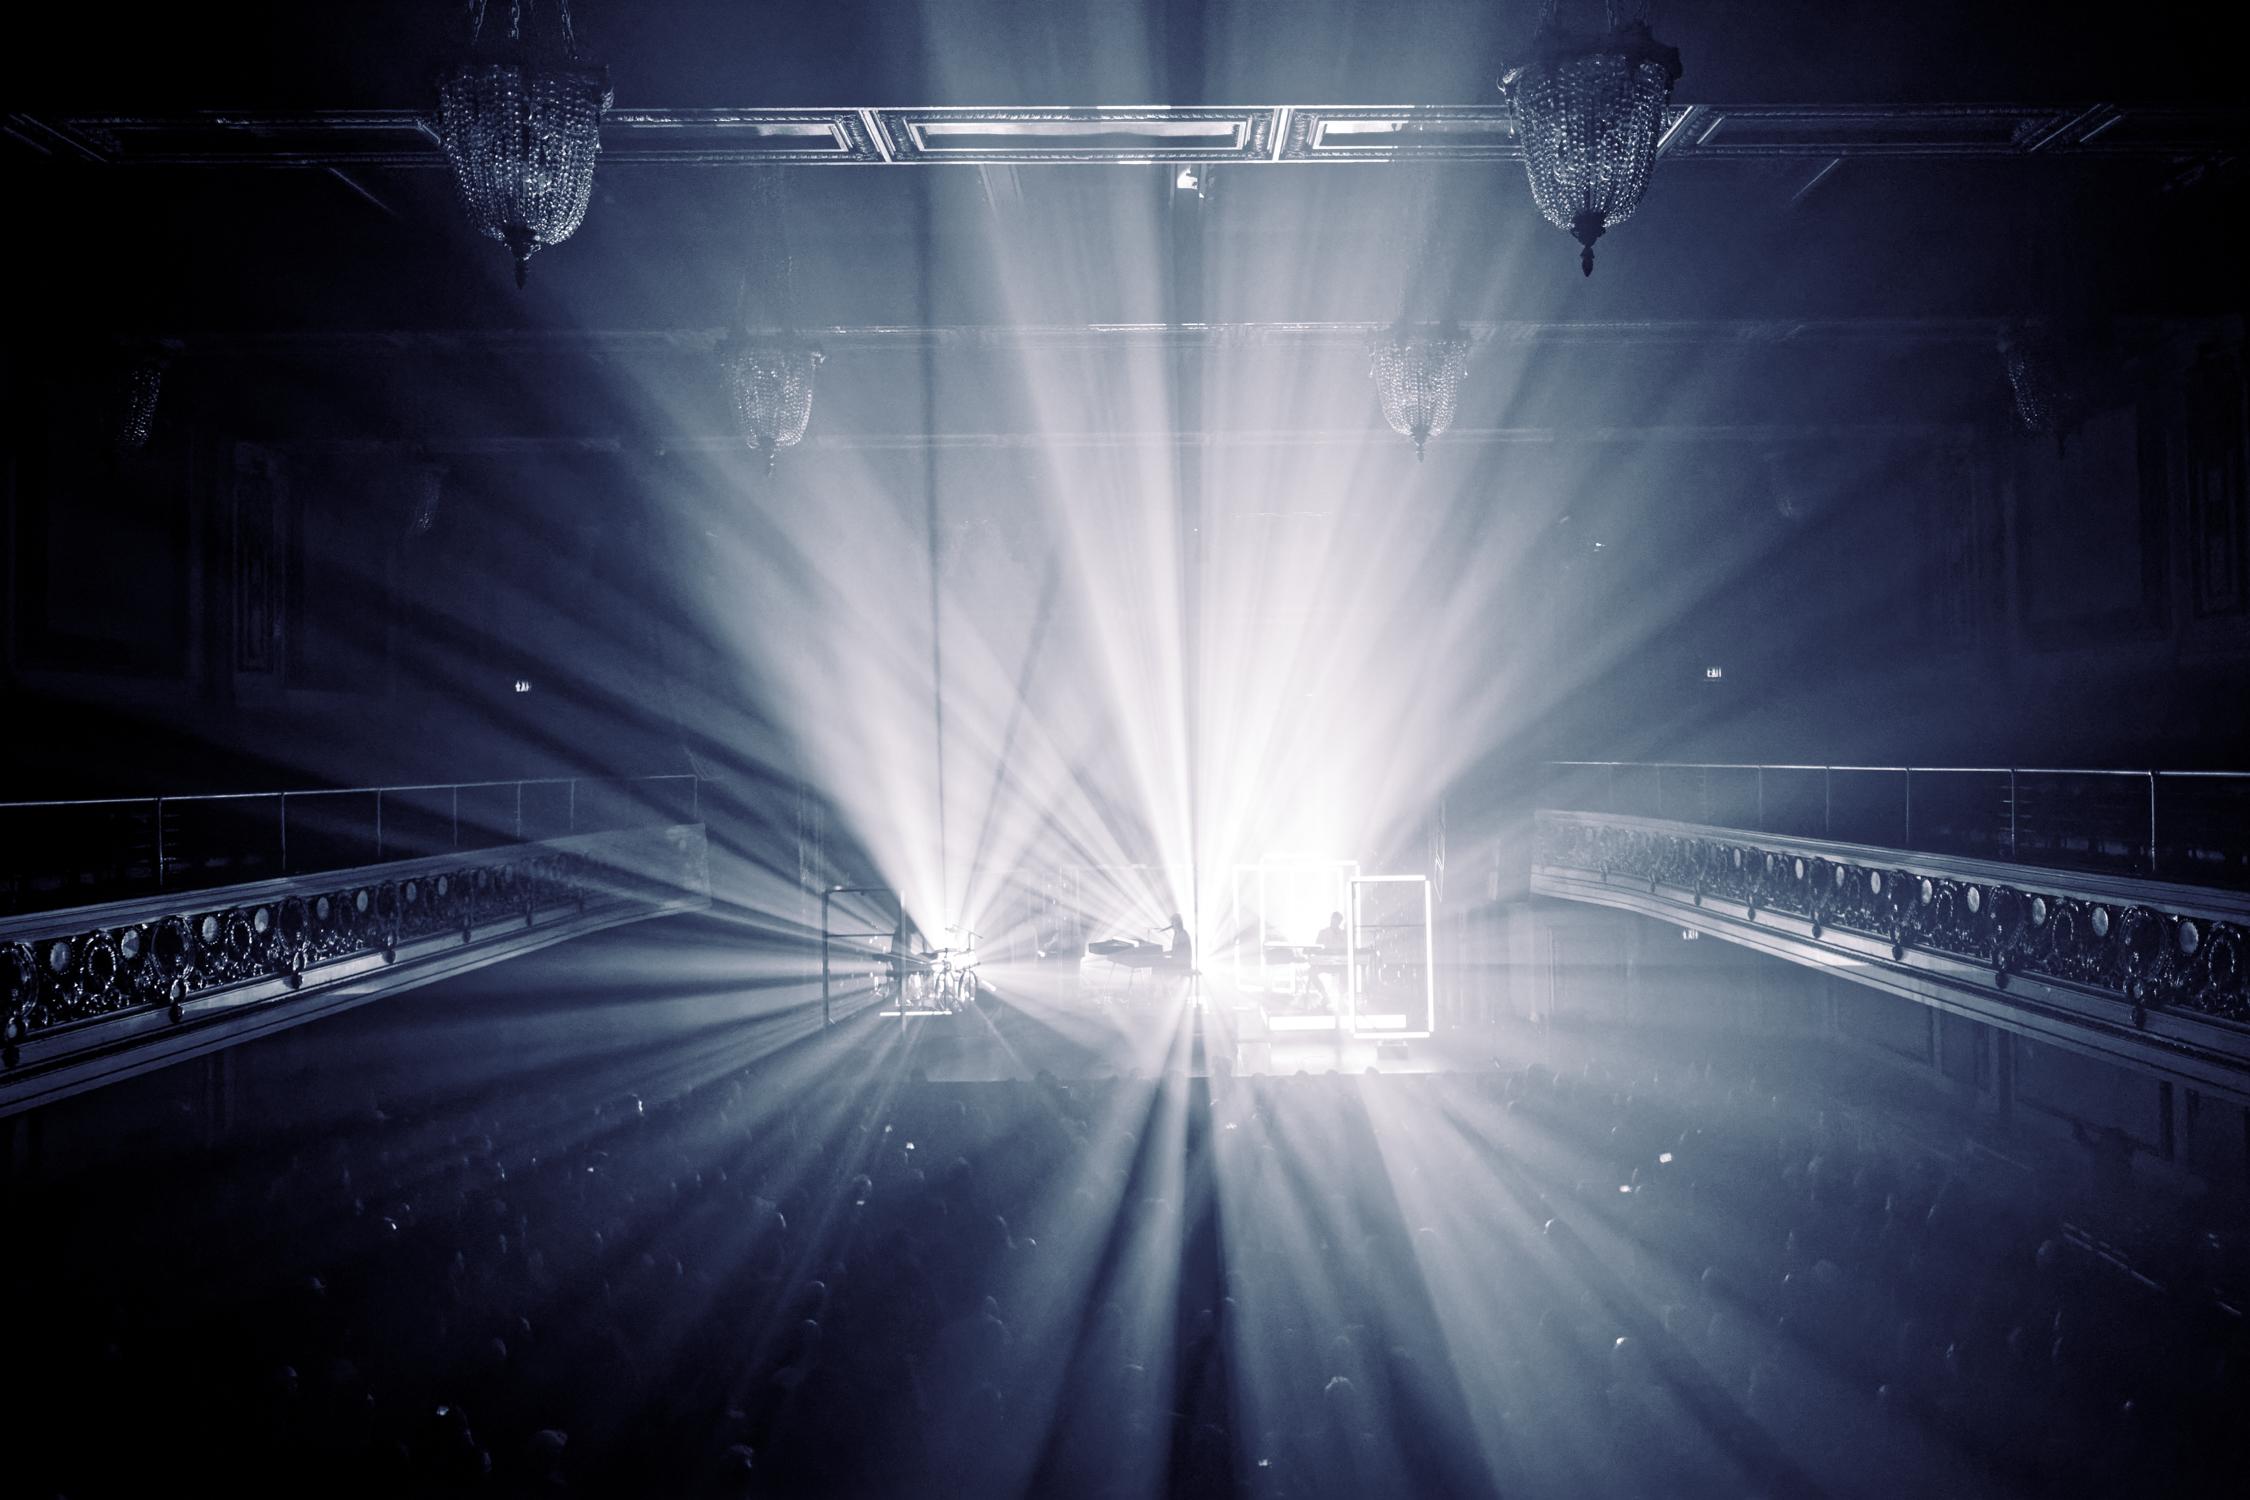 20190415 306 The Regency Ballroom - Charlotte Gainsbourg by Jon Bauer.jpg